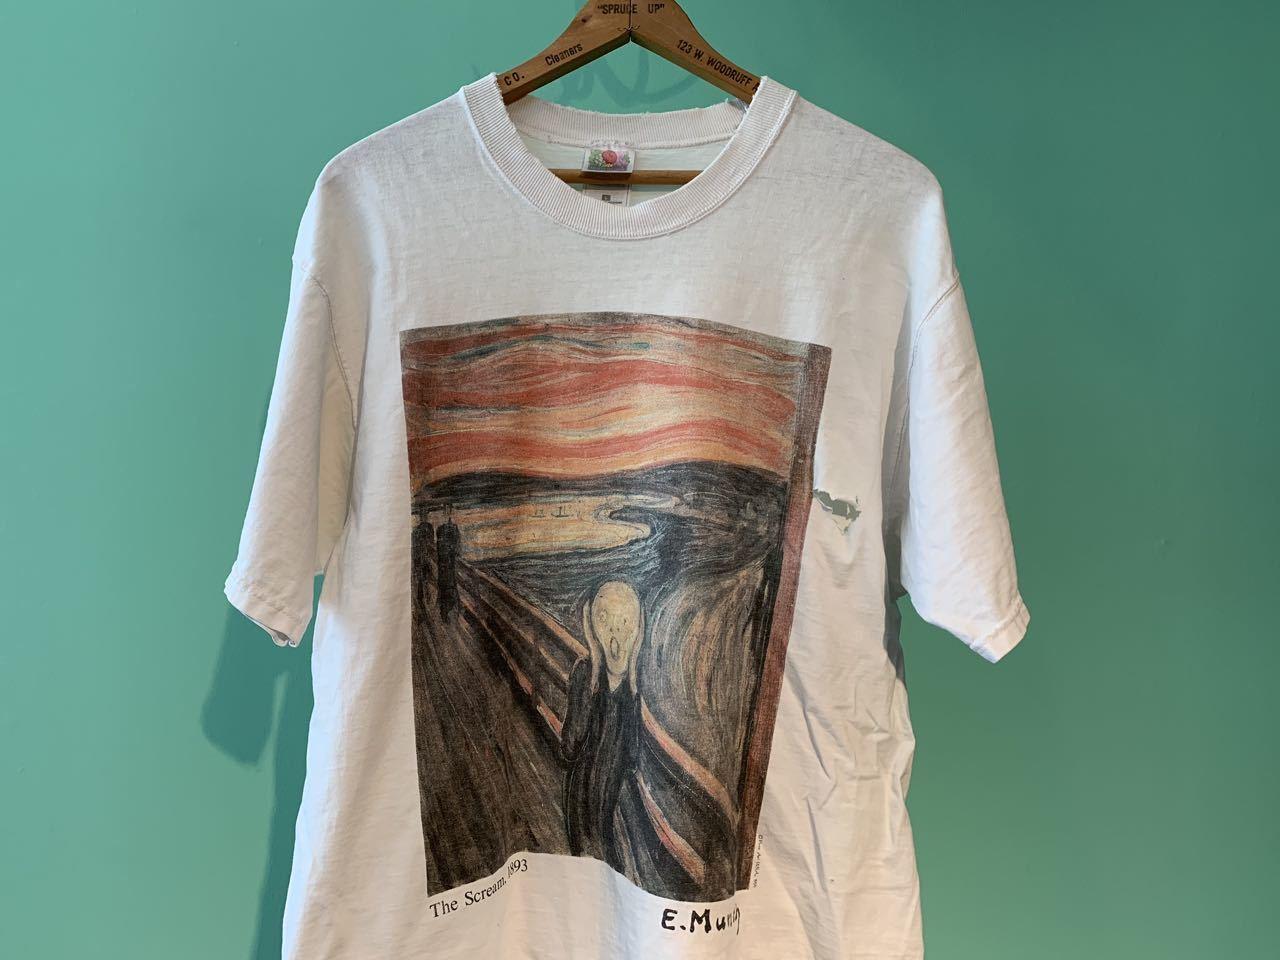 90s アメリカ製 ムンク 『叫び』 Tシャツ!_c0144020_11431128.jpg